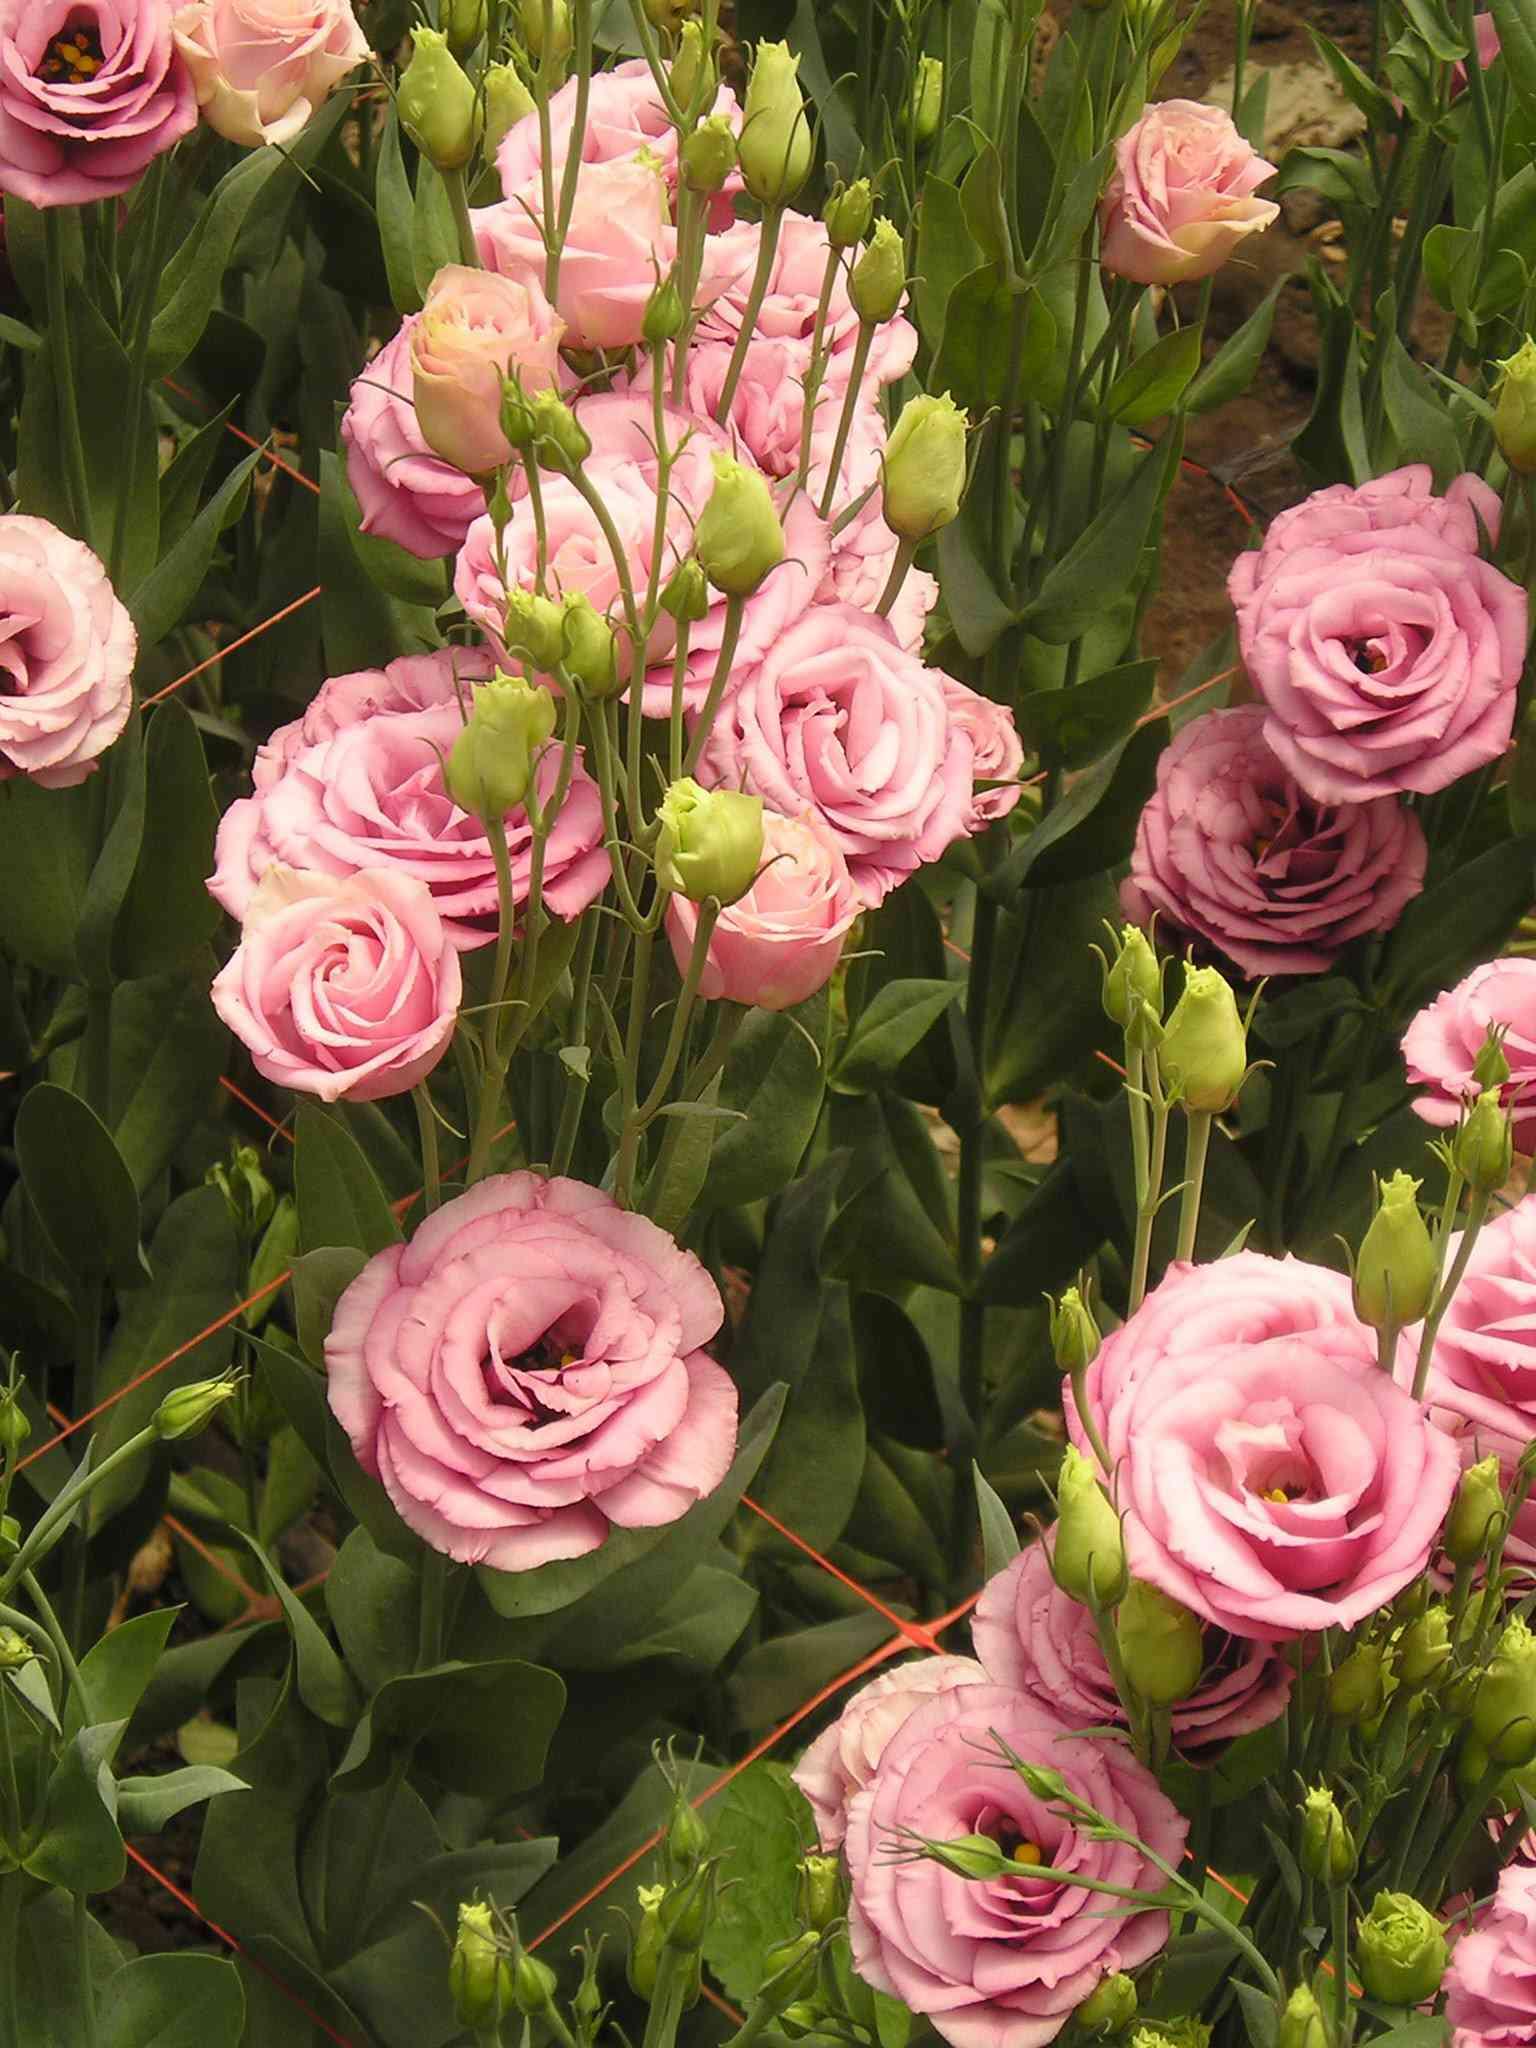 9 loai hoa dat nhat hanh tinh, co loai den vang 9999 cung khong la gi - 16